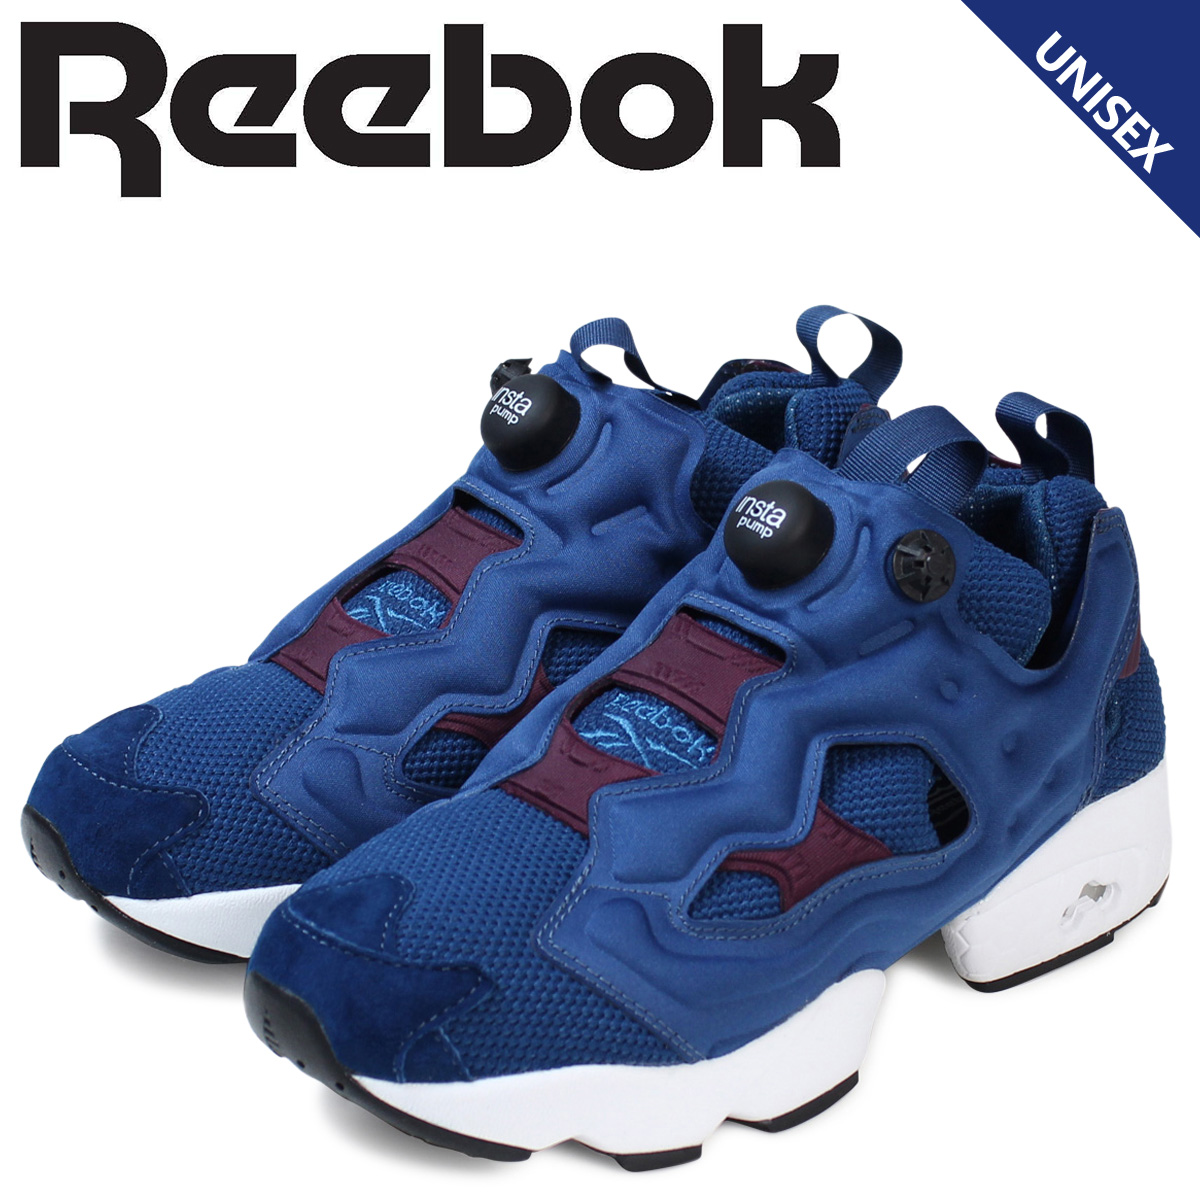 Whats up Sports  Reebok Reebok pump fury sneakers INSTA PUMP FURY OG 20th  anniversary M46895 men s women s shoes purple  918fdaa76